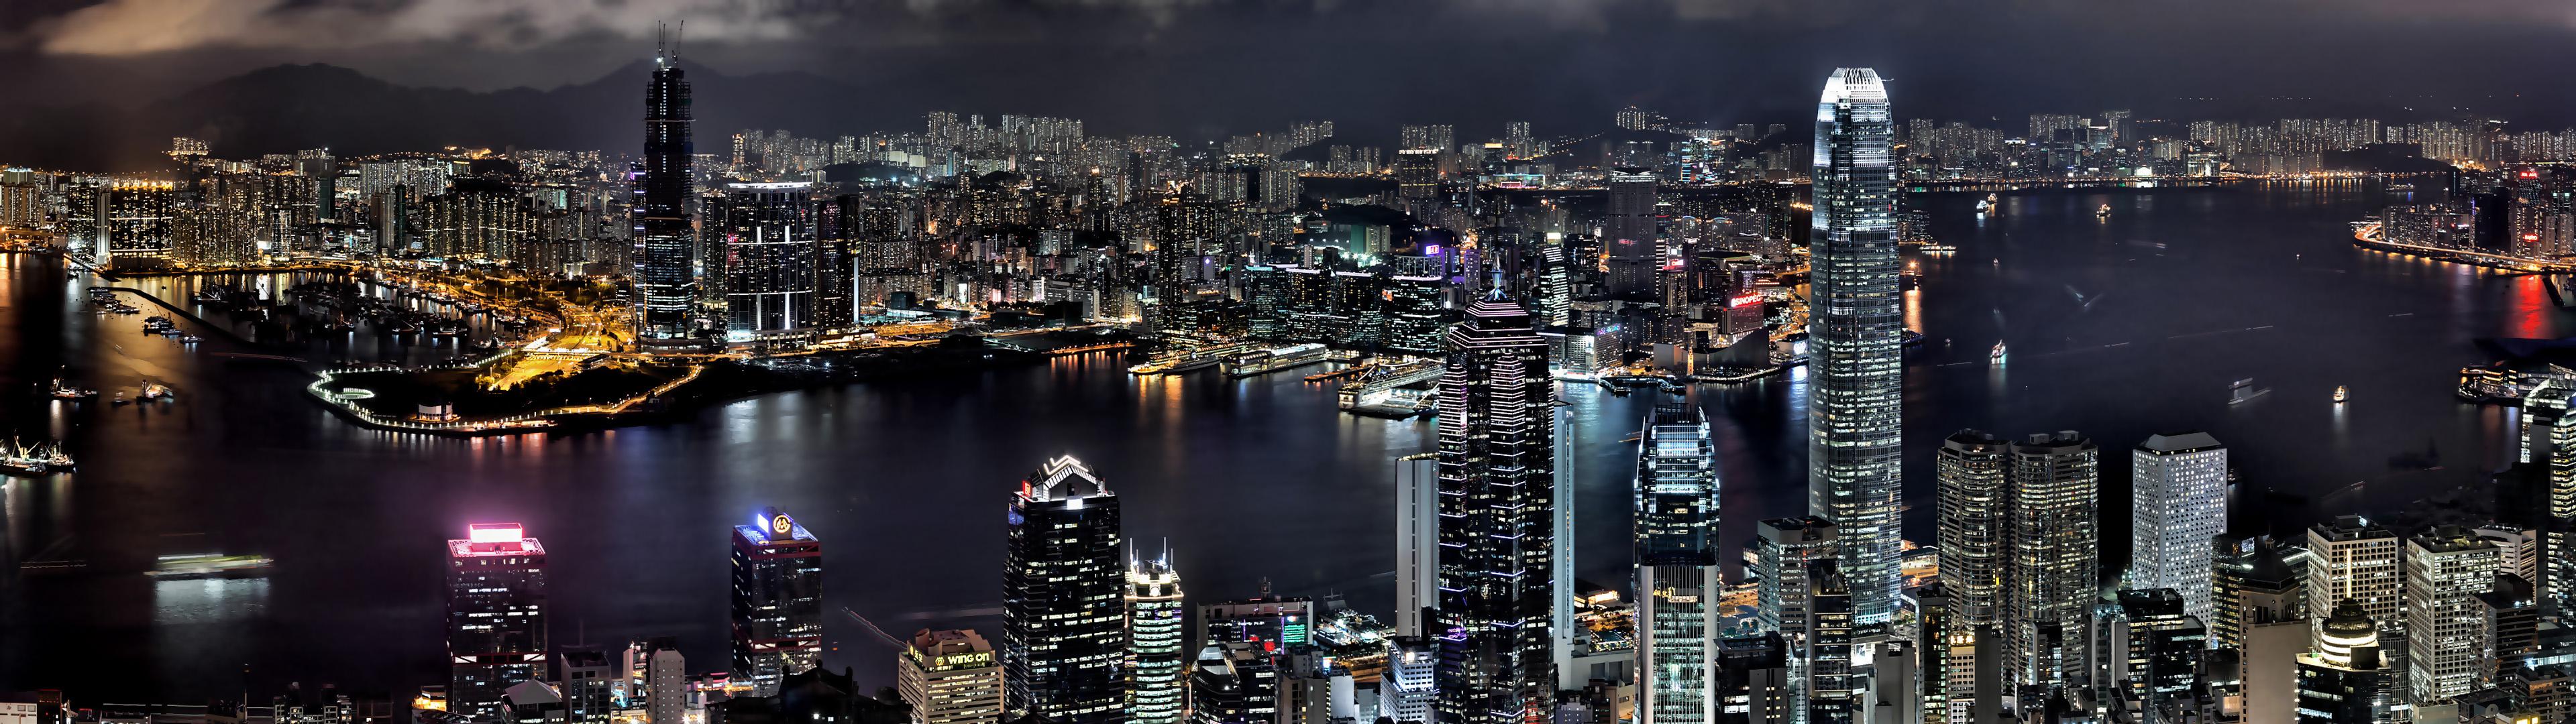 Cityscapes-night-buildings-Hong-Kong-x1080-UP-wallpaper-wpc5803511